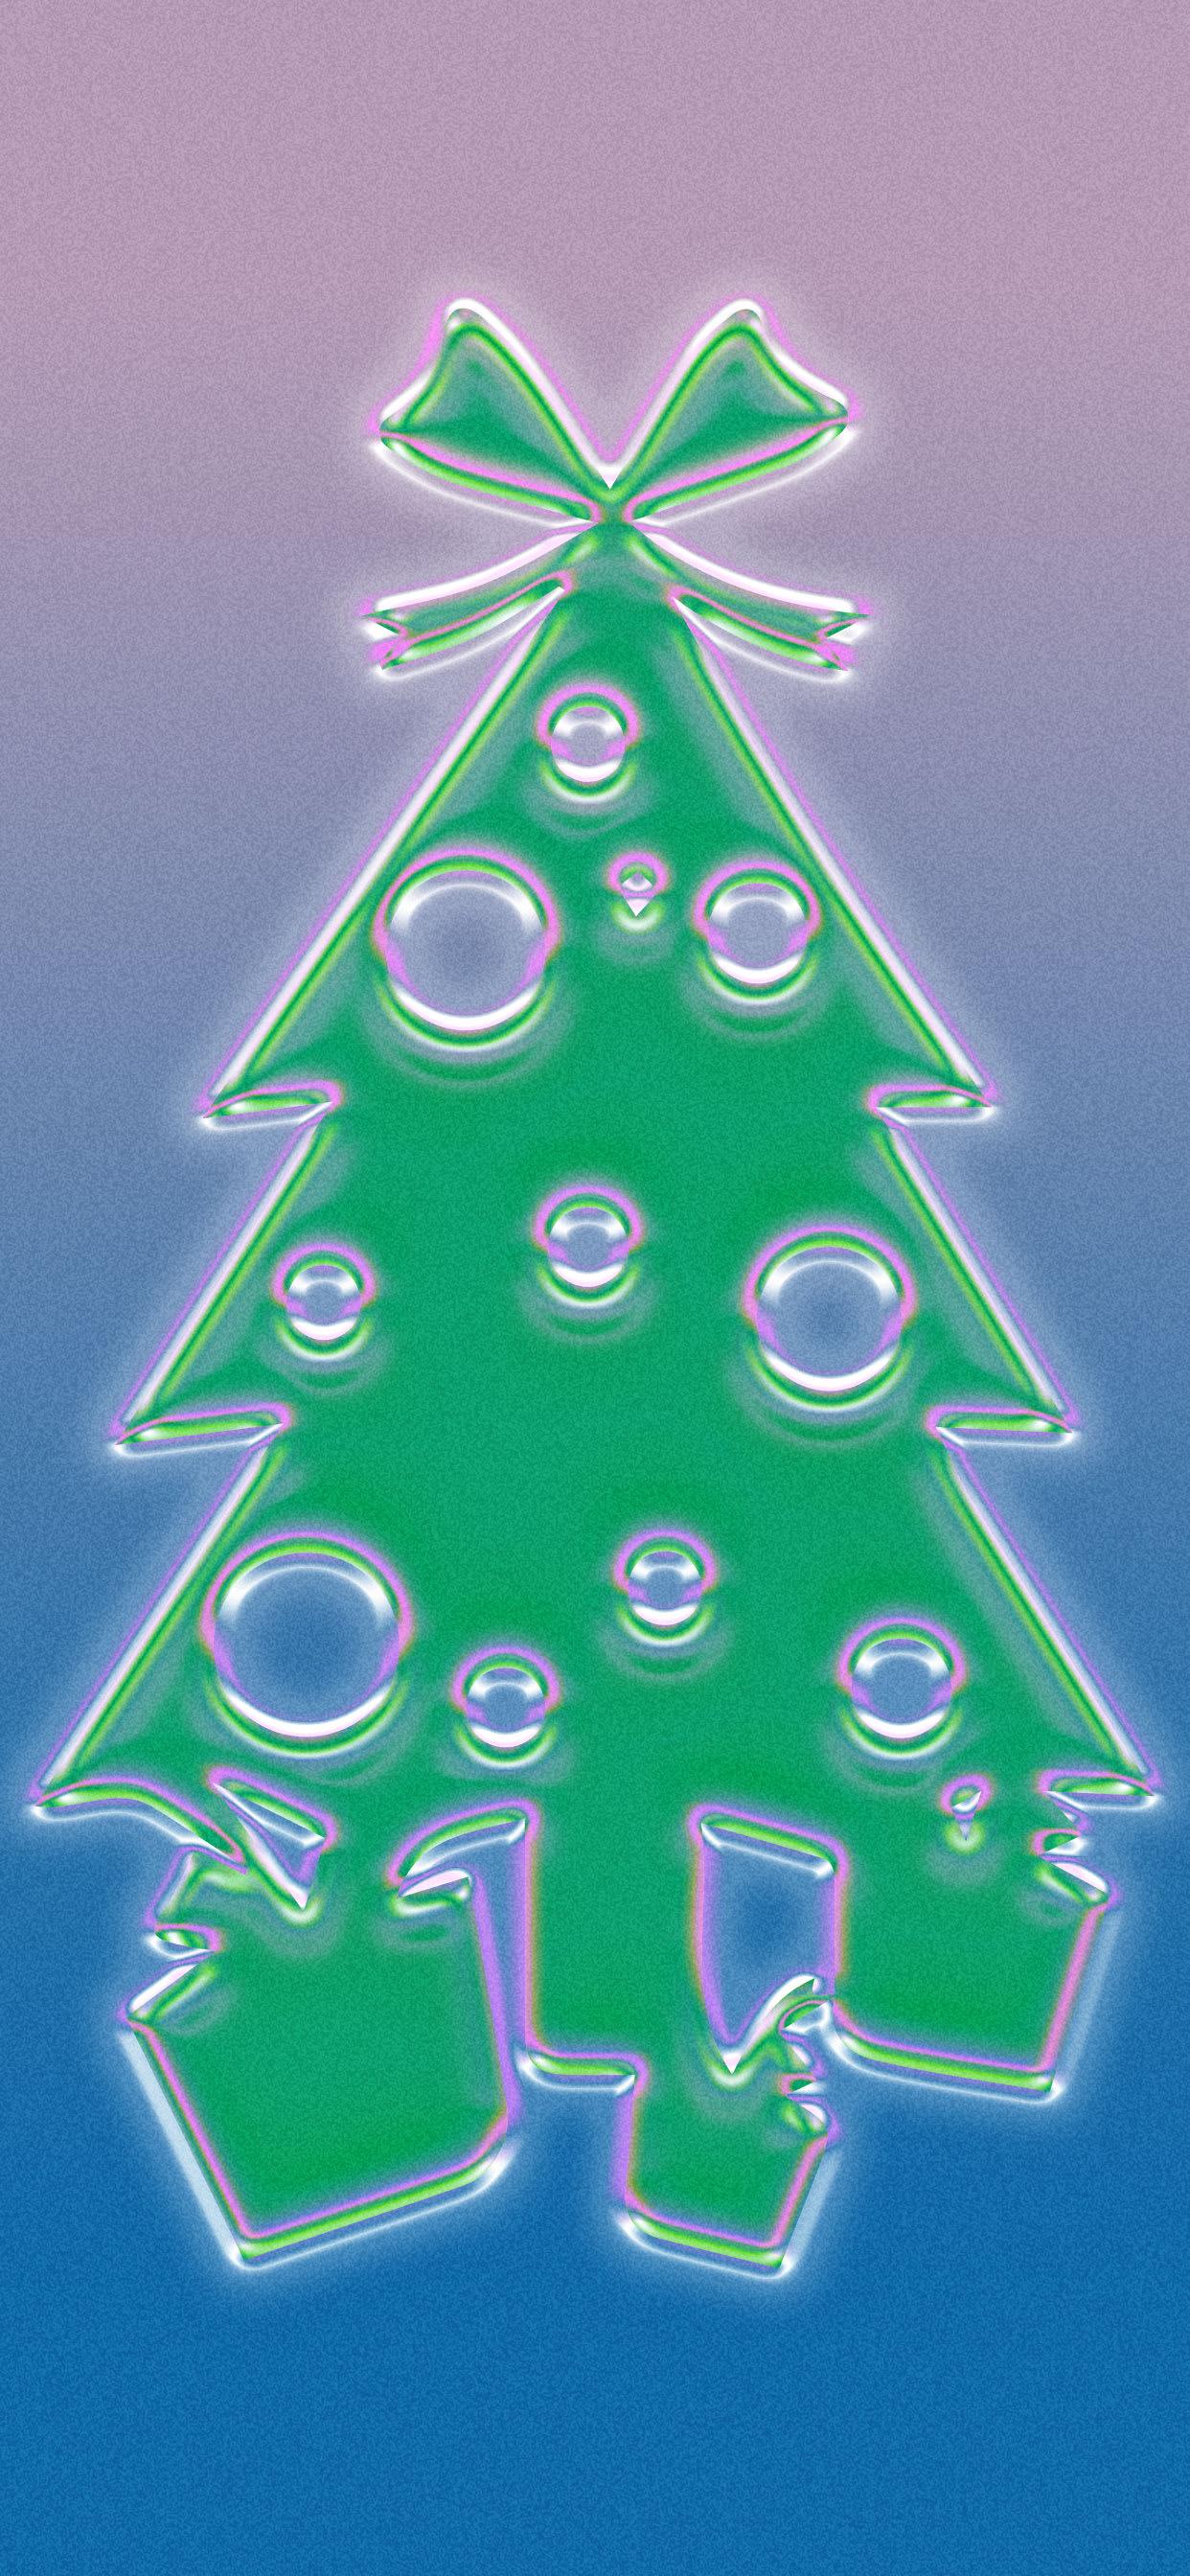 allapplenews-wallpaper-Christmas